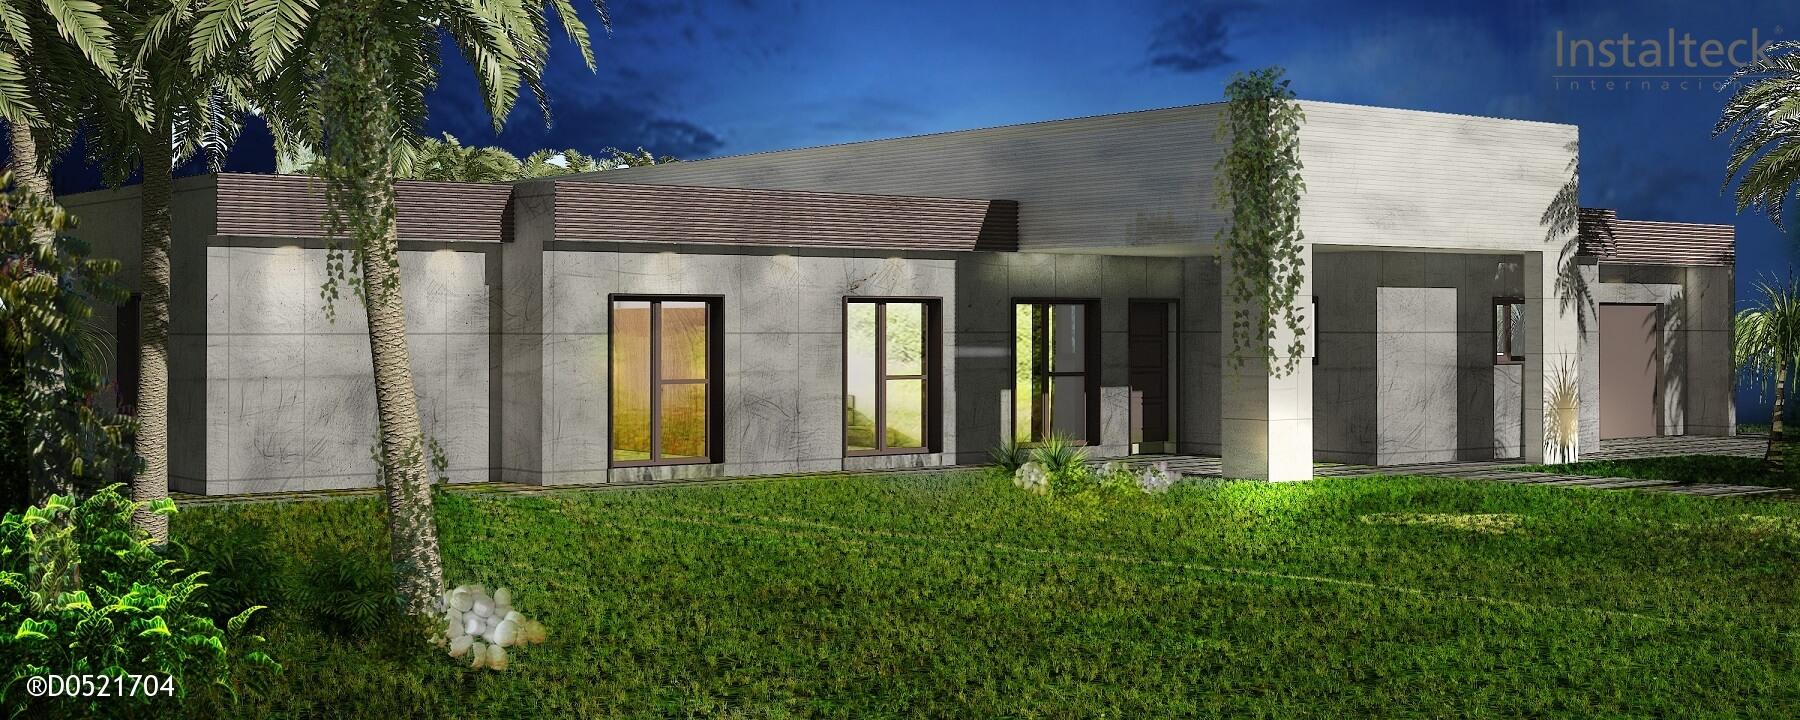 Instalteck modelo de casa modular 297 valencia precio - Precio de casas prefabricadas de hormigon ...